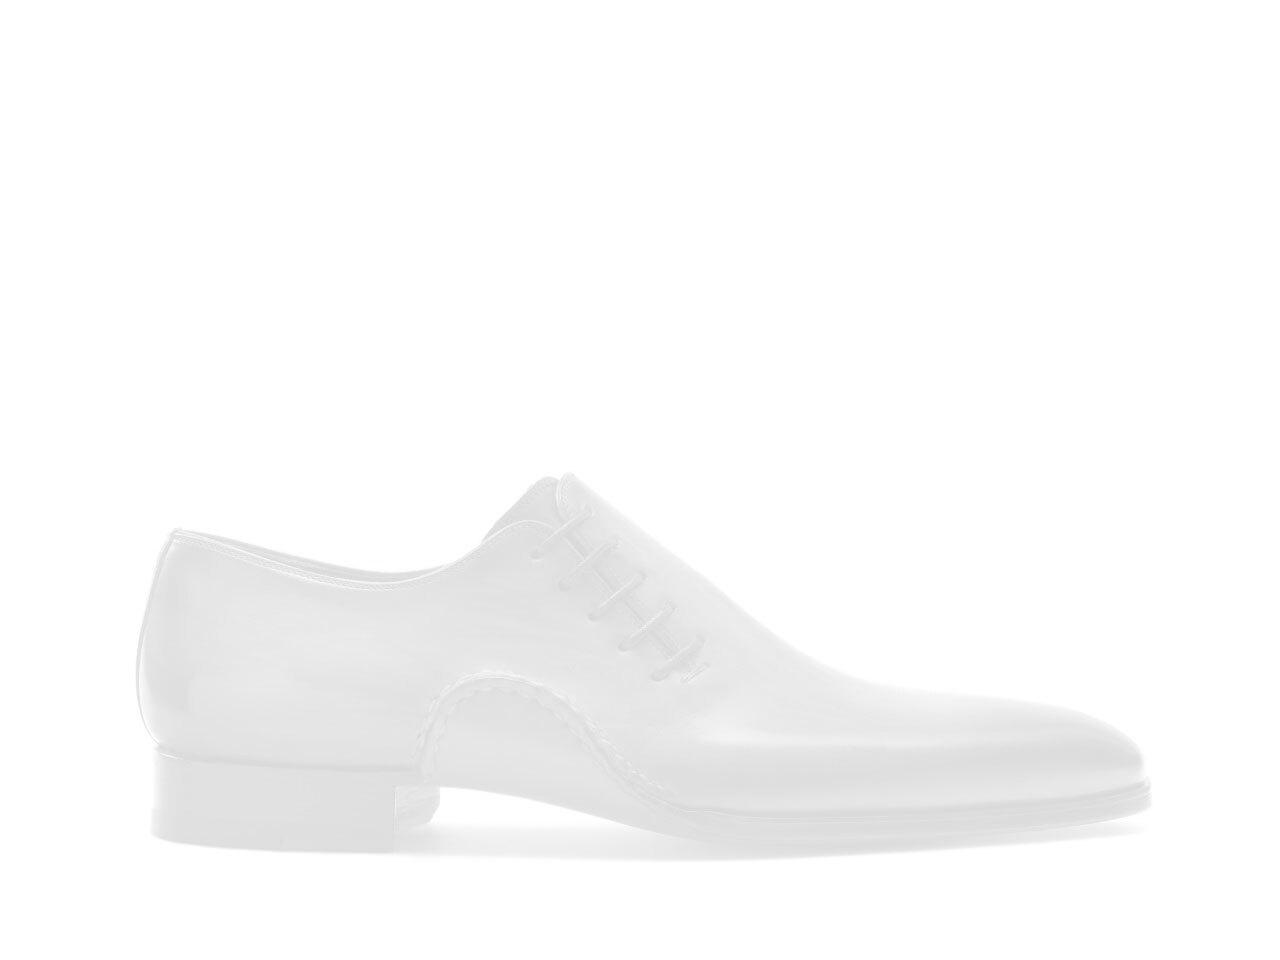 Pair of the Magnanni Merino Midbrown Men's Sneakers